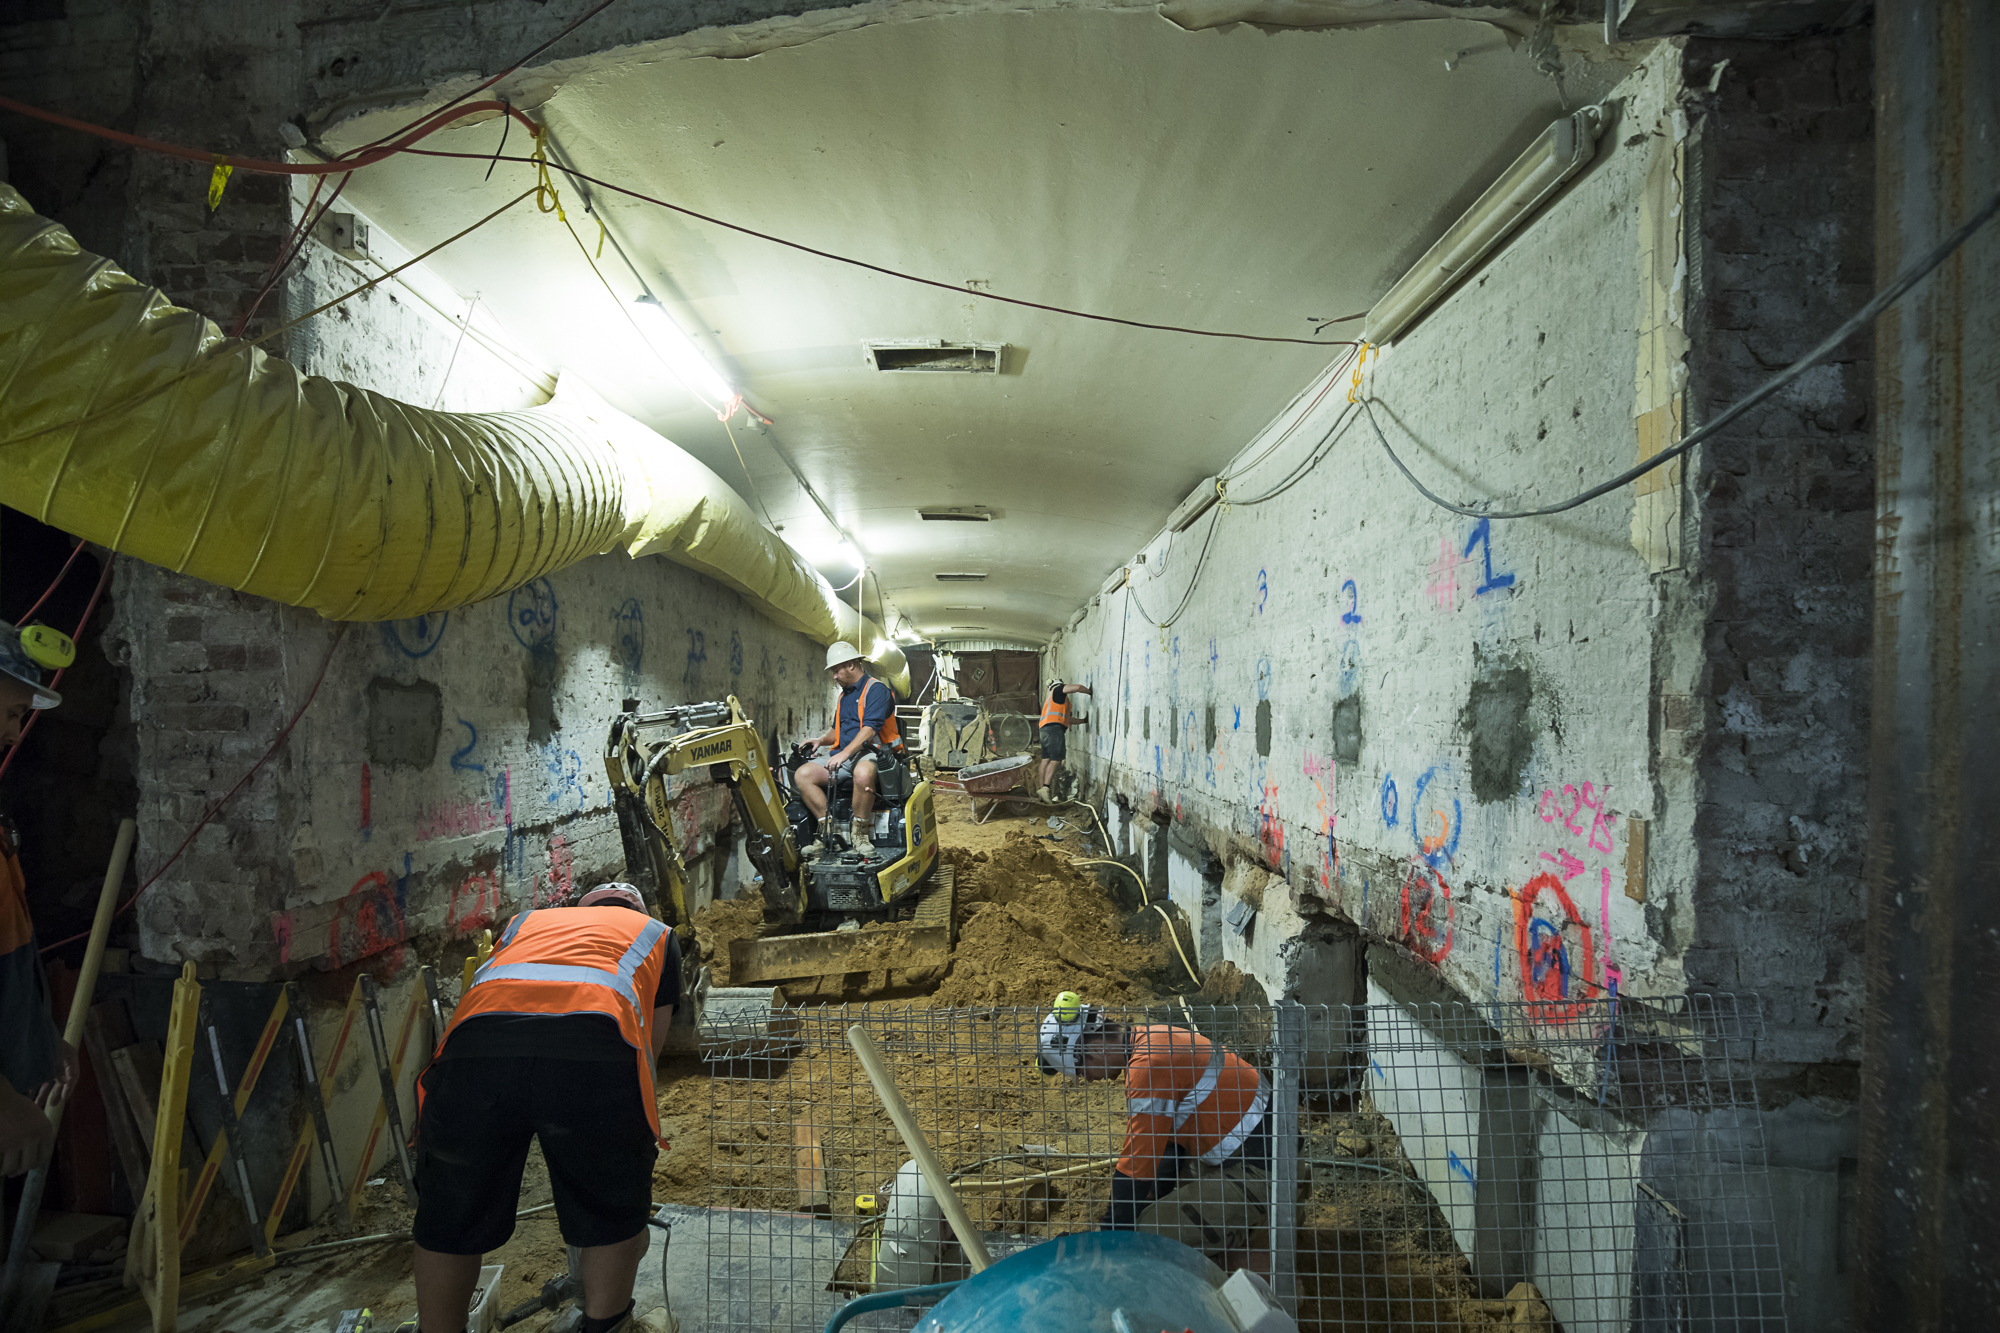 035 Hunter Tunnel Underpinning Works BOT